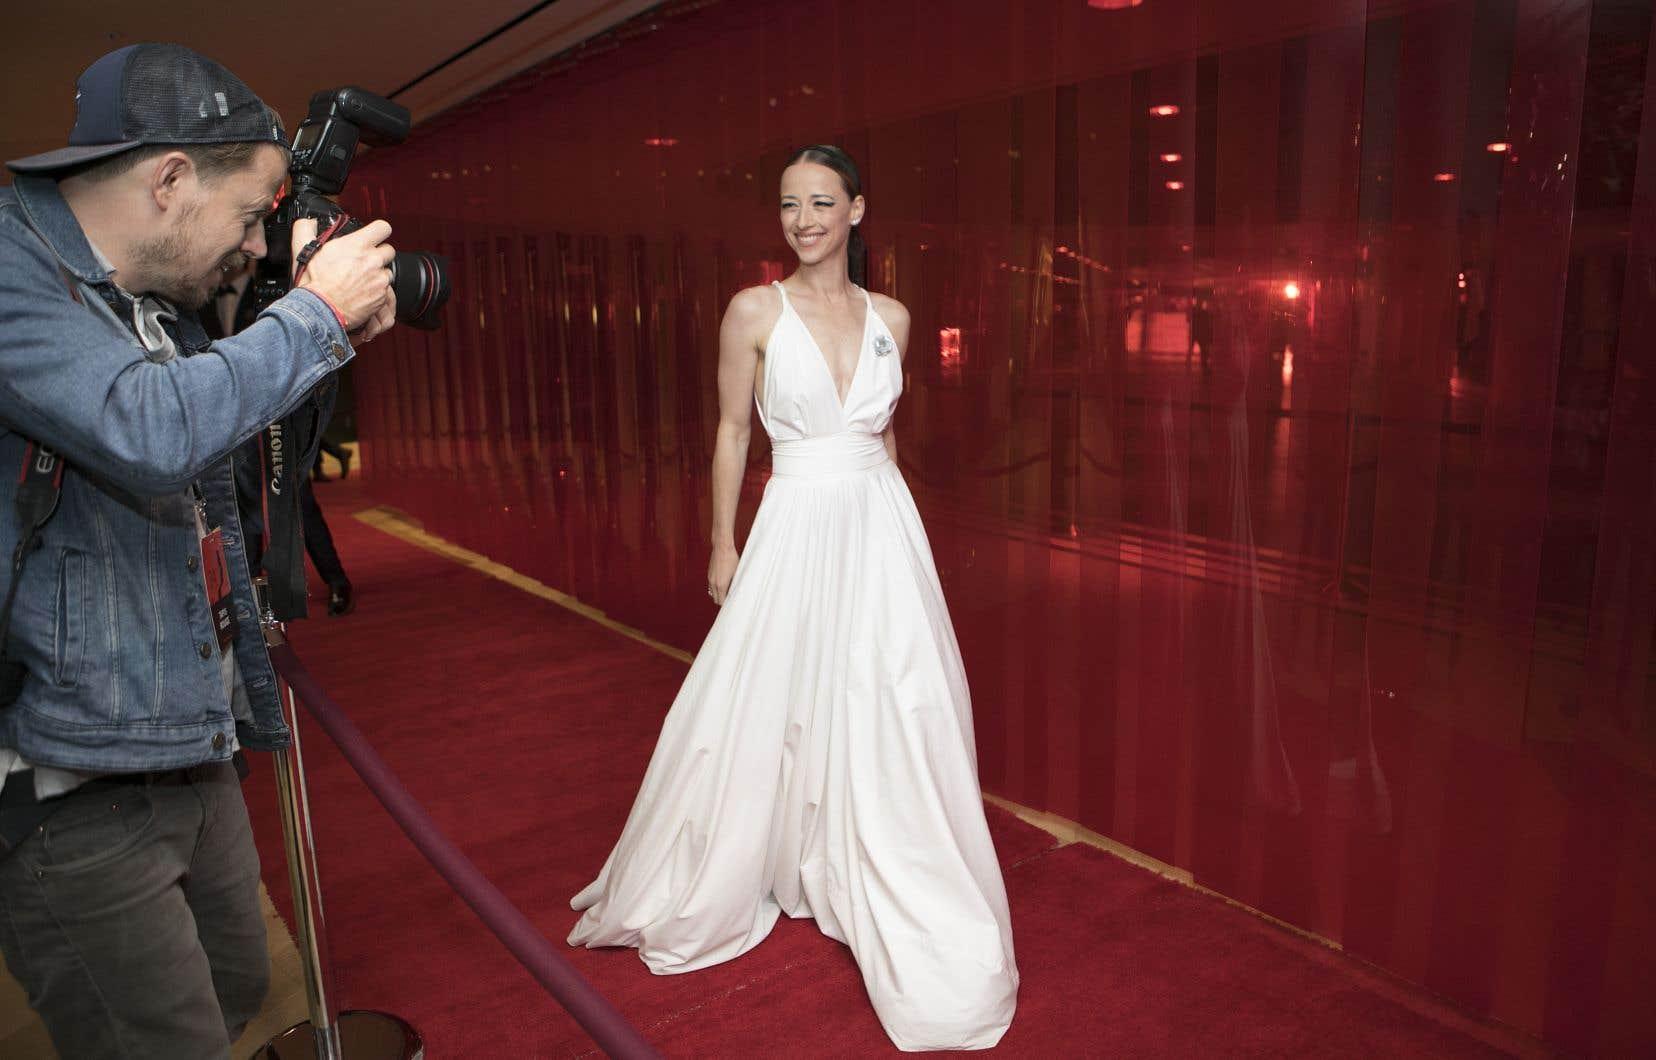 Karine Vanasse lors du gala des prix Gémeaux en 2019